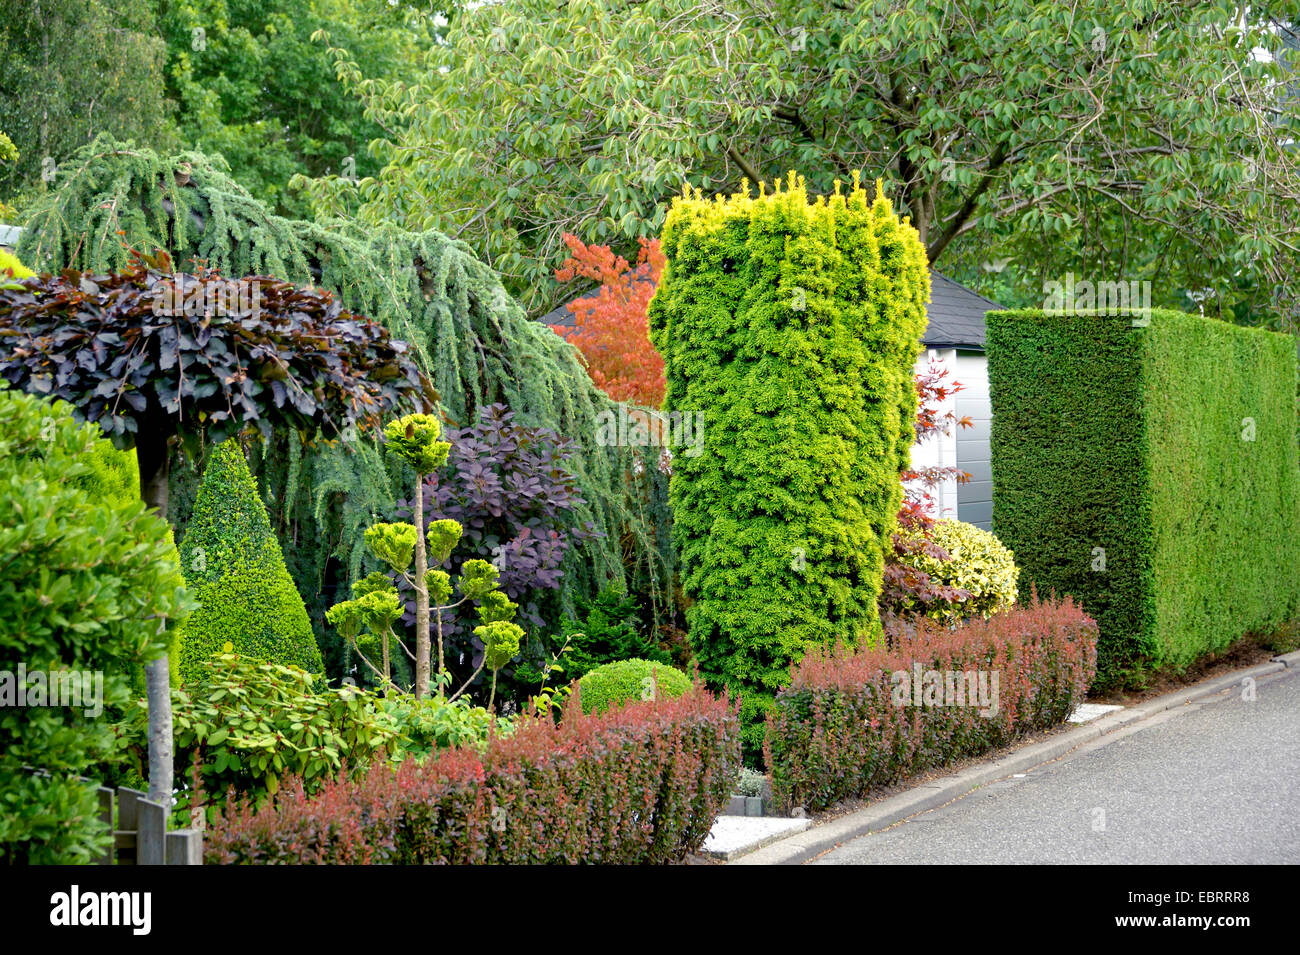 berberis hedge stockfotos berberis hedge bilder alamy. Black Bedroom Furniture Sets. Home Design Ideas